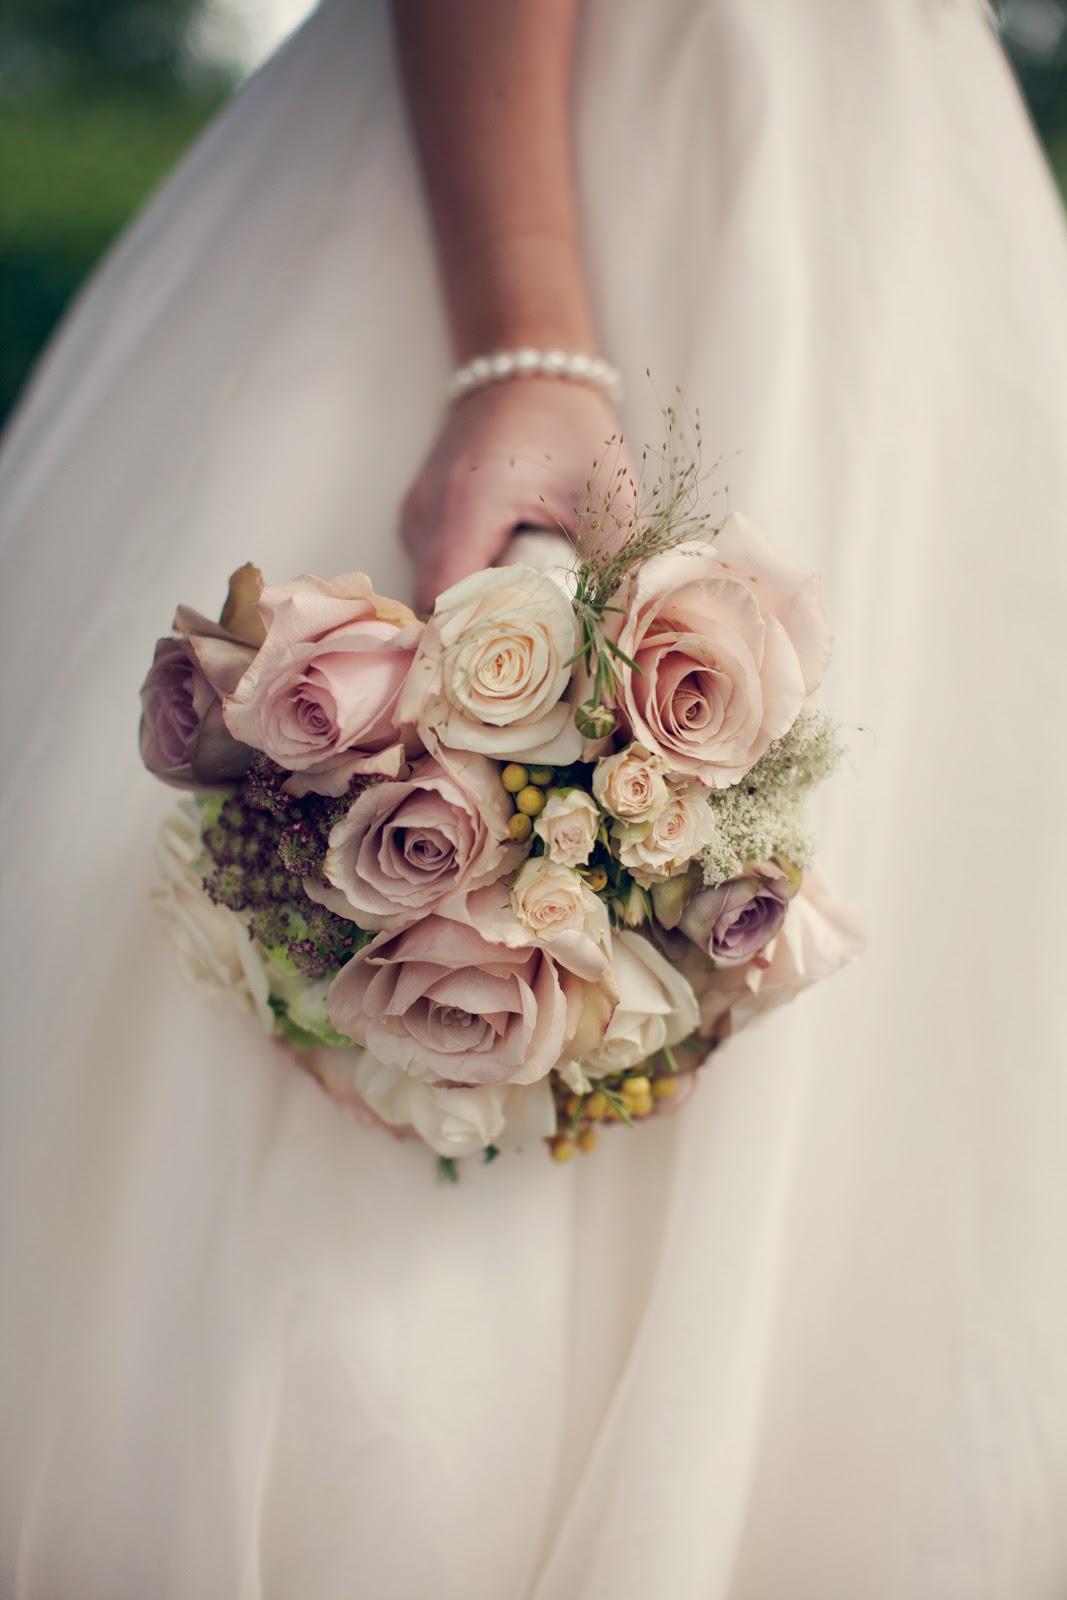 wedding flowers by season photo - 1